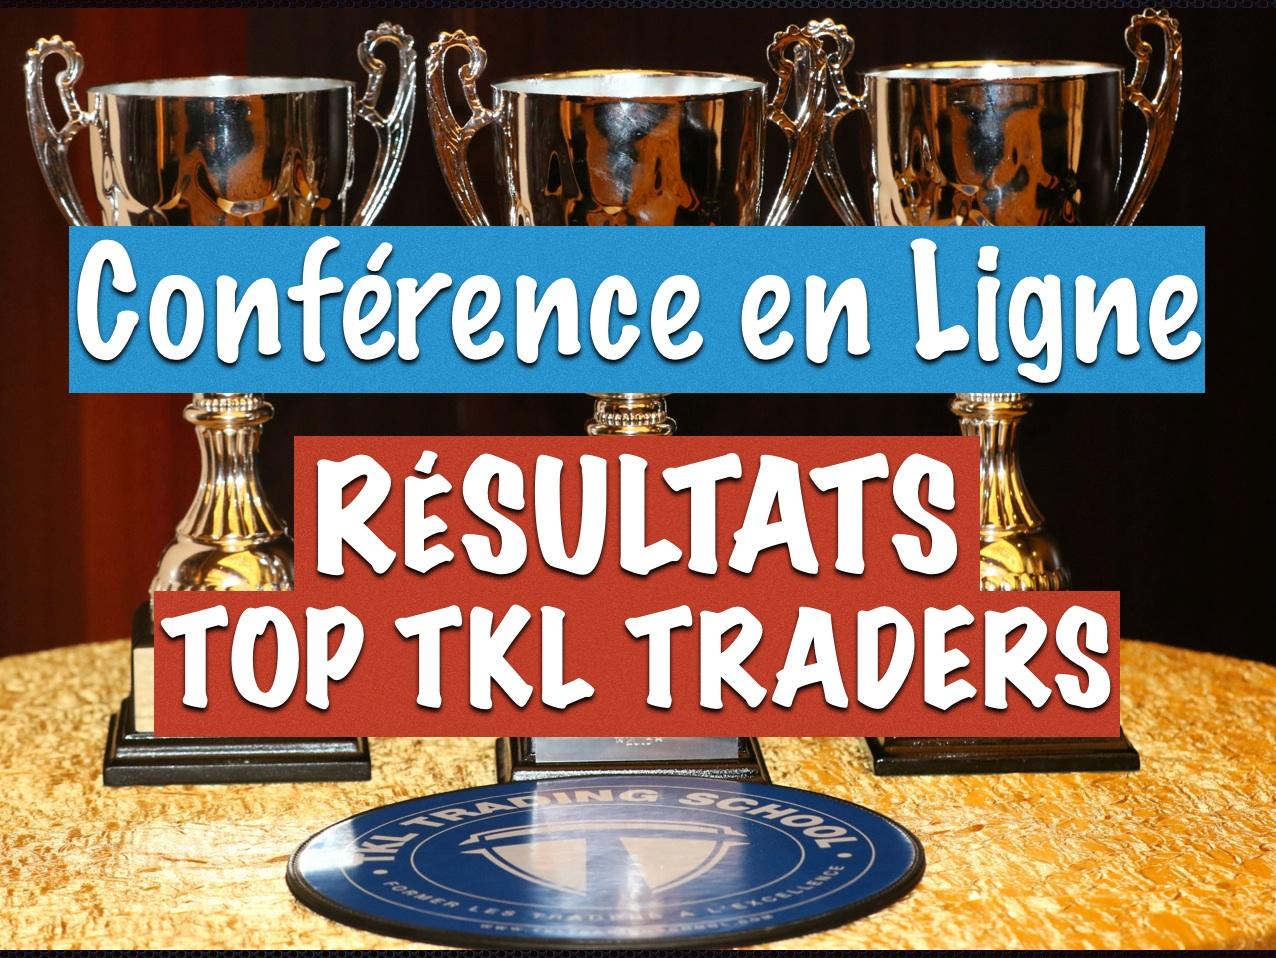 Resultats de la derniere competition de Trading : TOP TKL TRADER